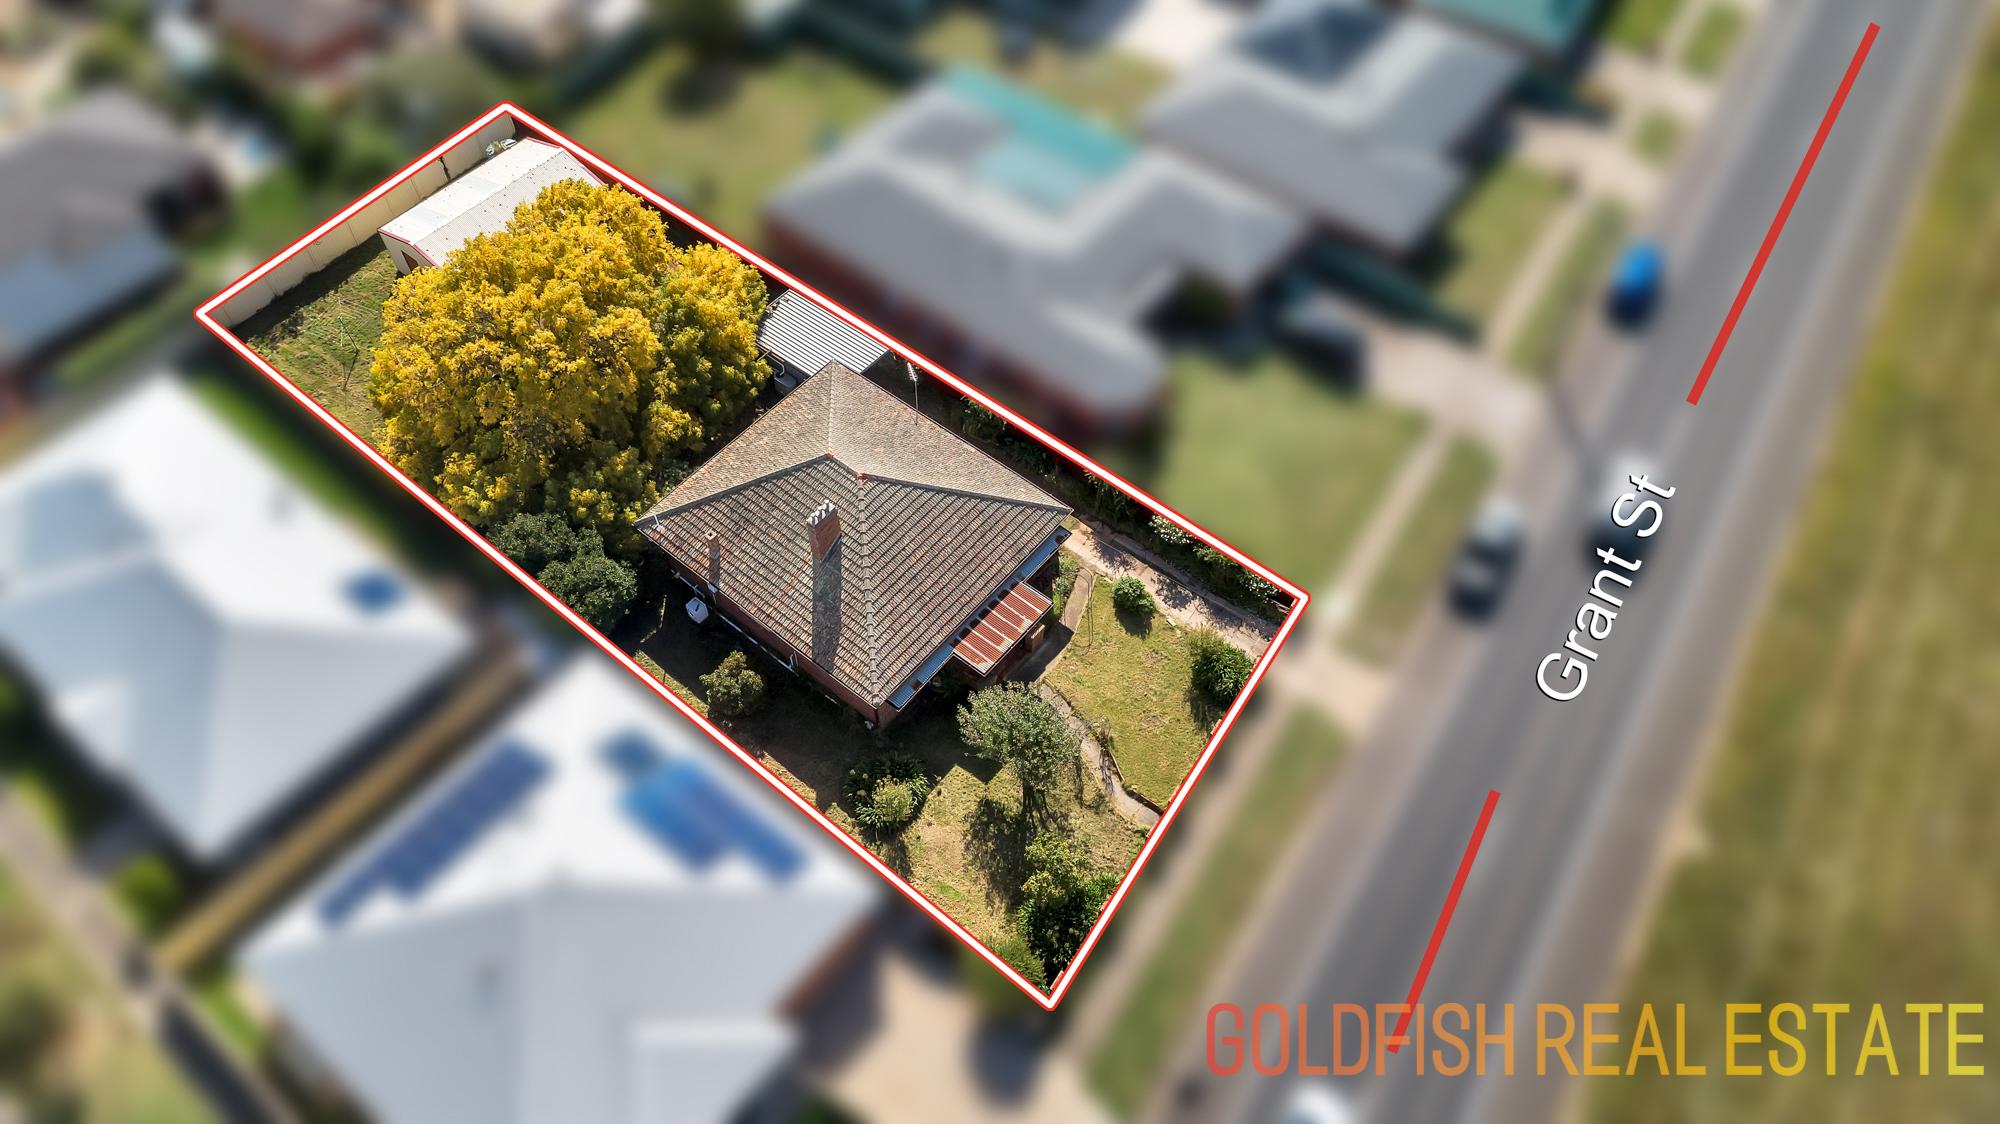 Goldfish Property Details